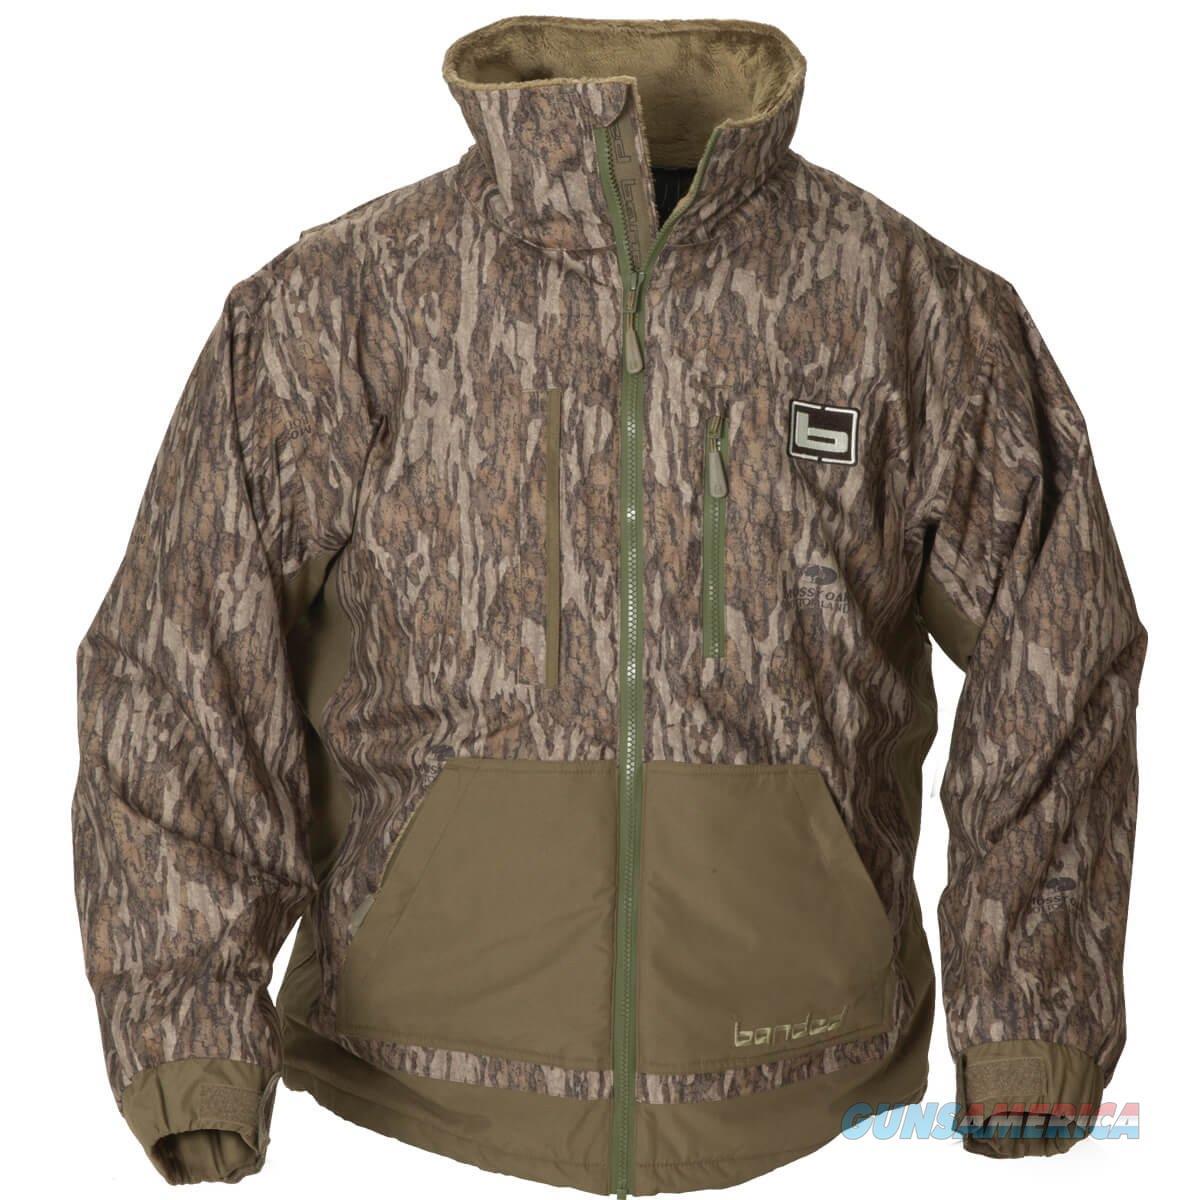 Banded Chesapeake Pullover Bottomland 2XL  Non-Guns > Shotgun Sports > Vests/Jackets